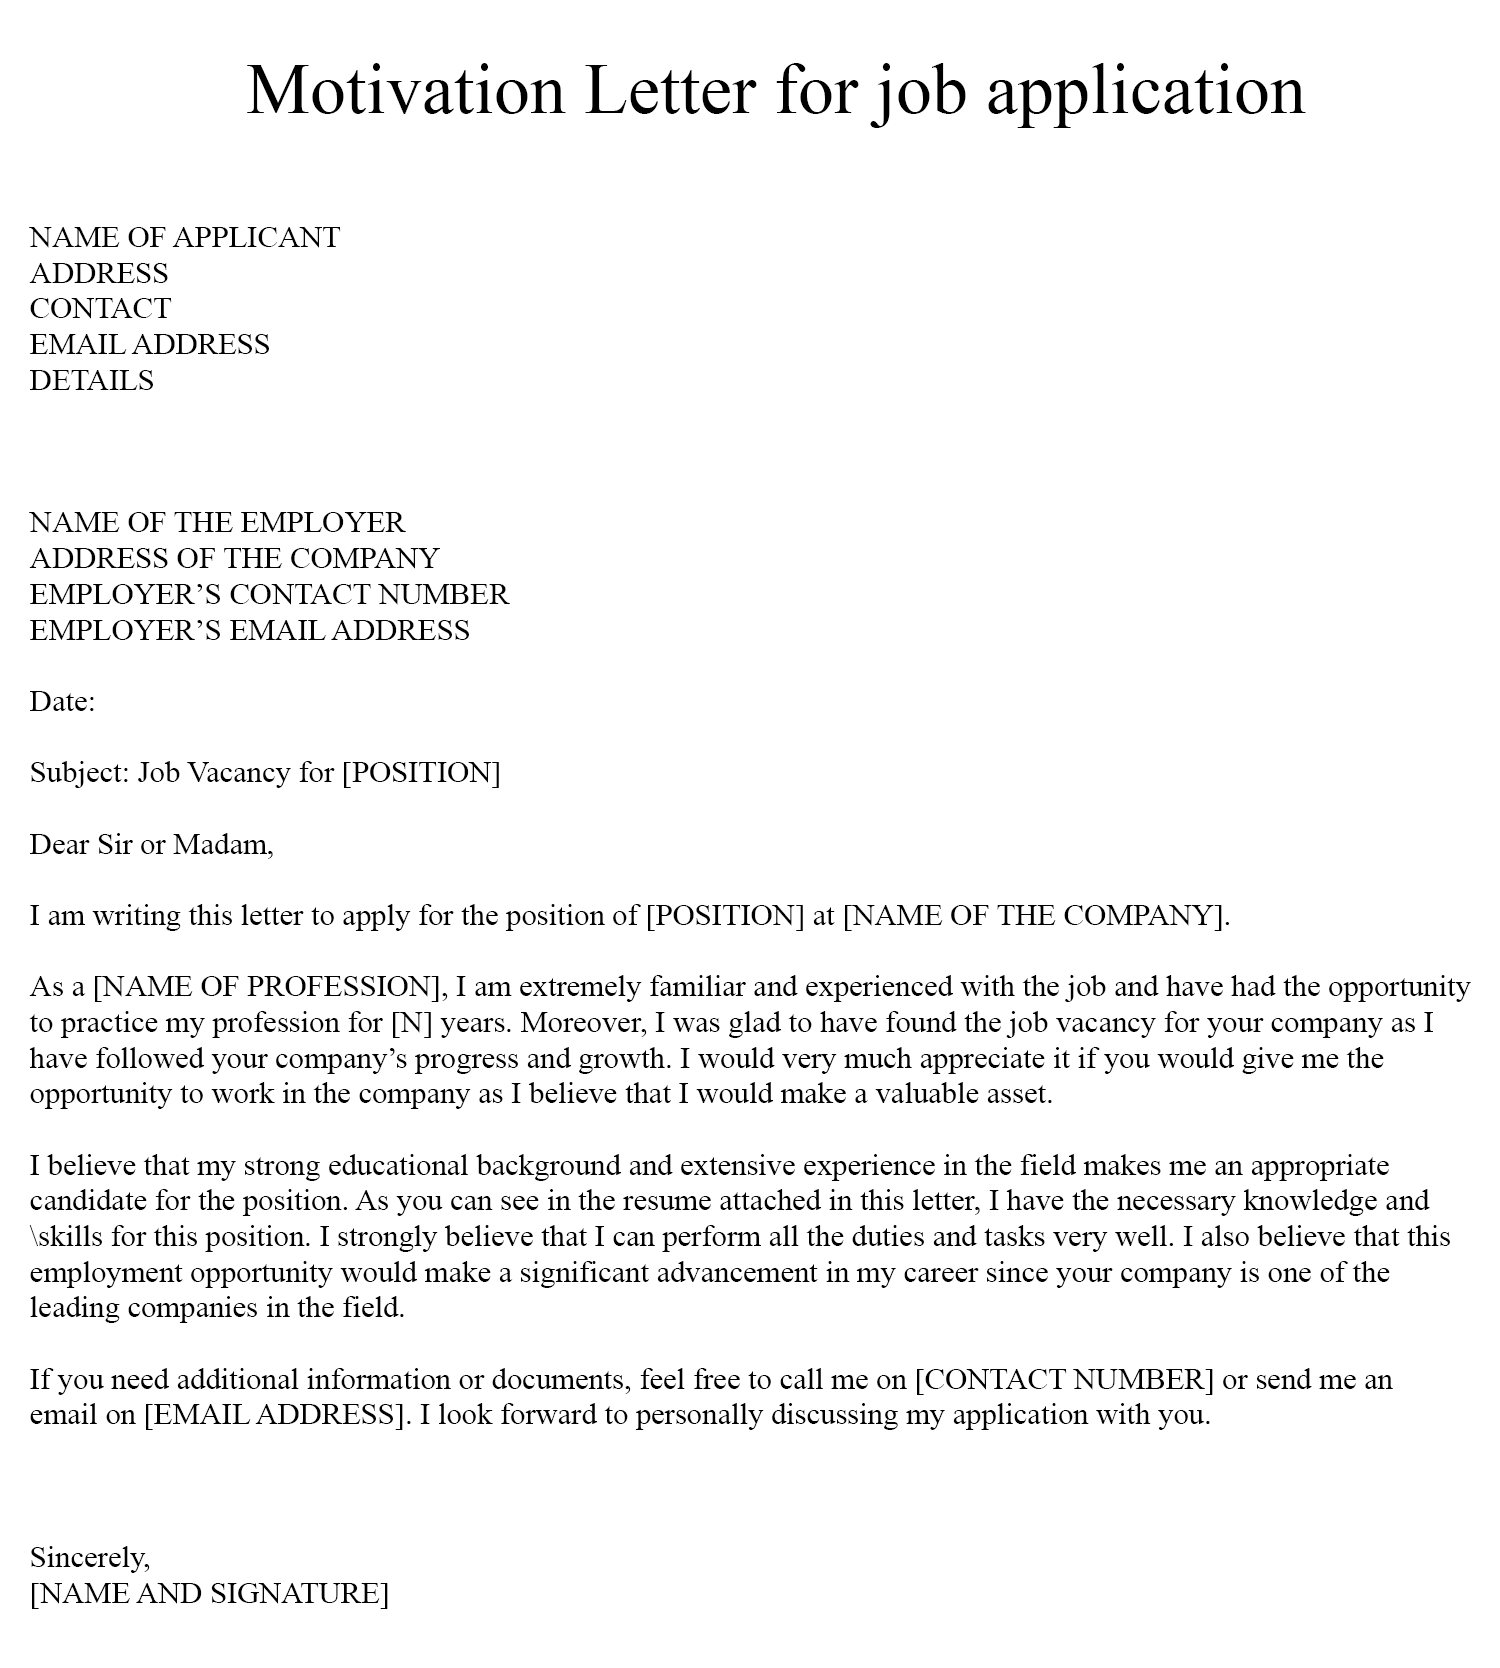 Motivation Letter for Job Application Example